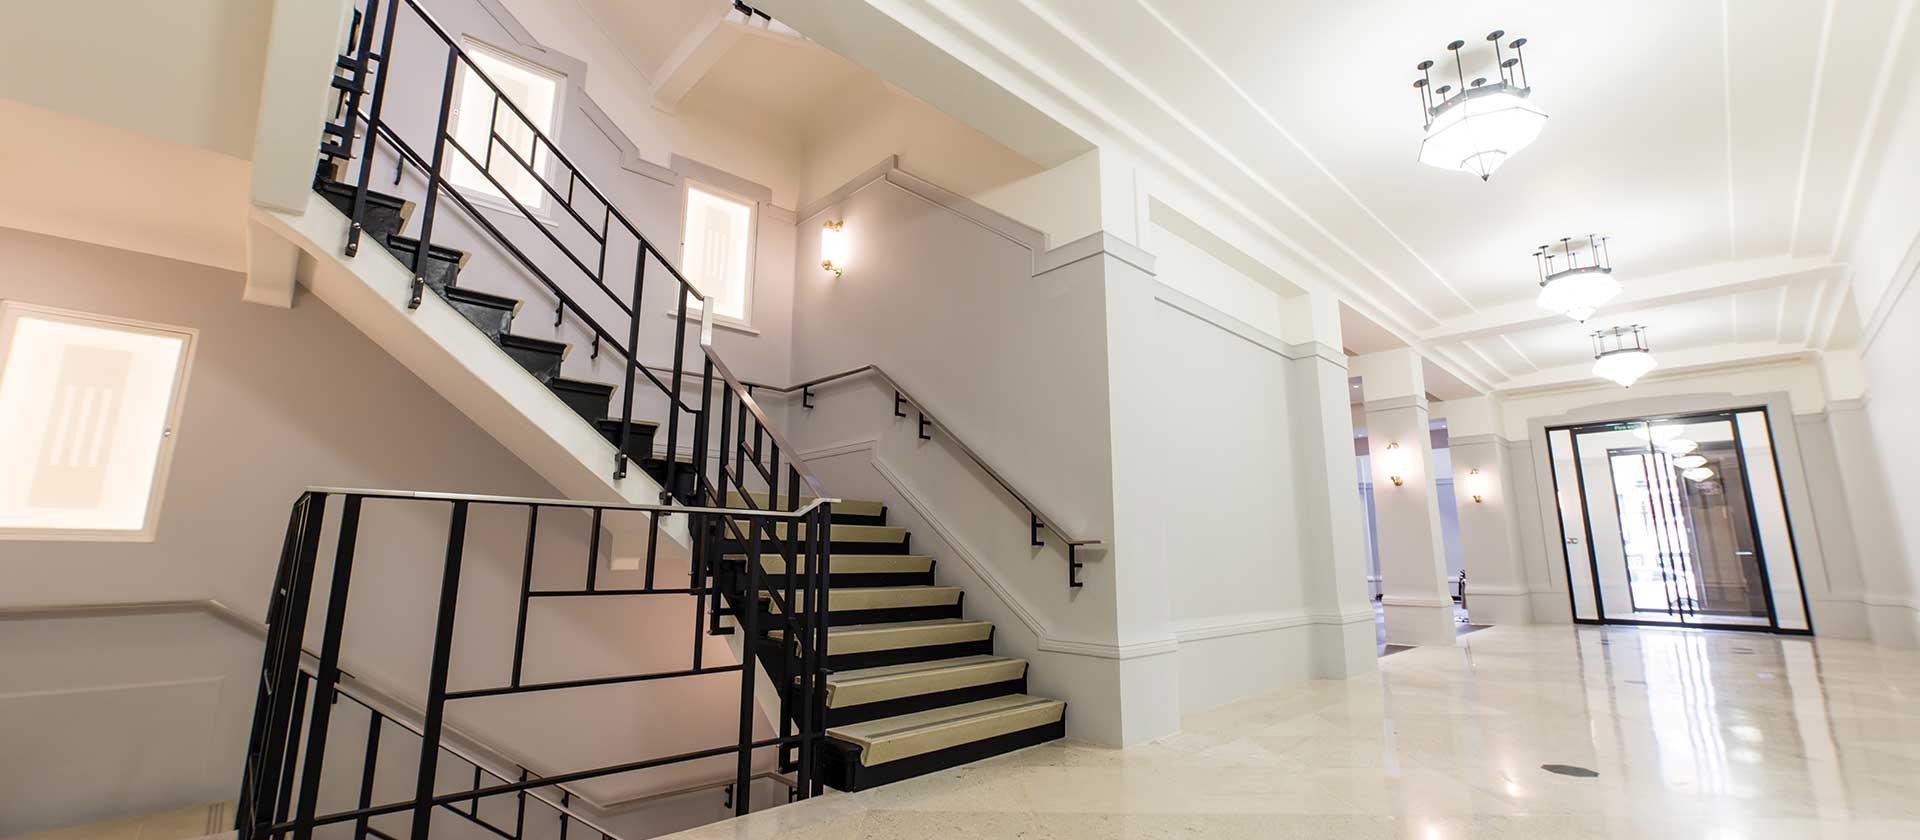 Trainor-Stone-and-Tile-Contractors-Belfast-London-Northern-Ireland-Summit-House